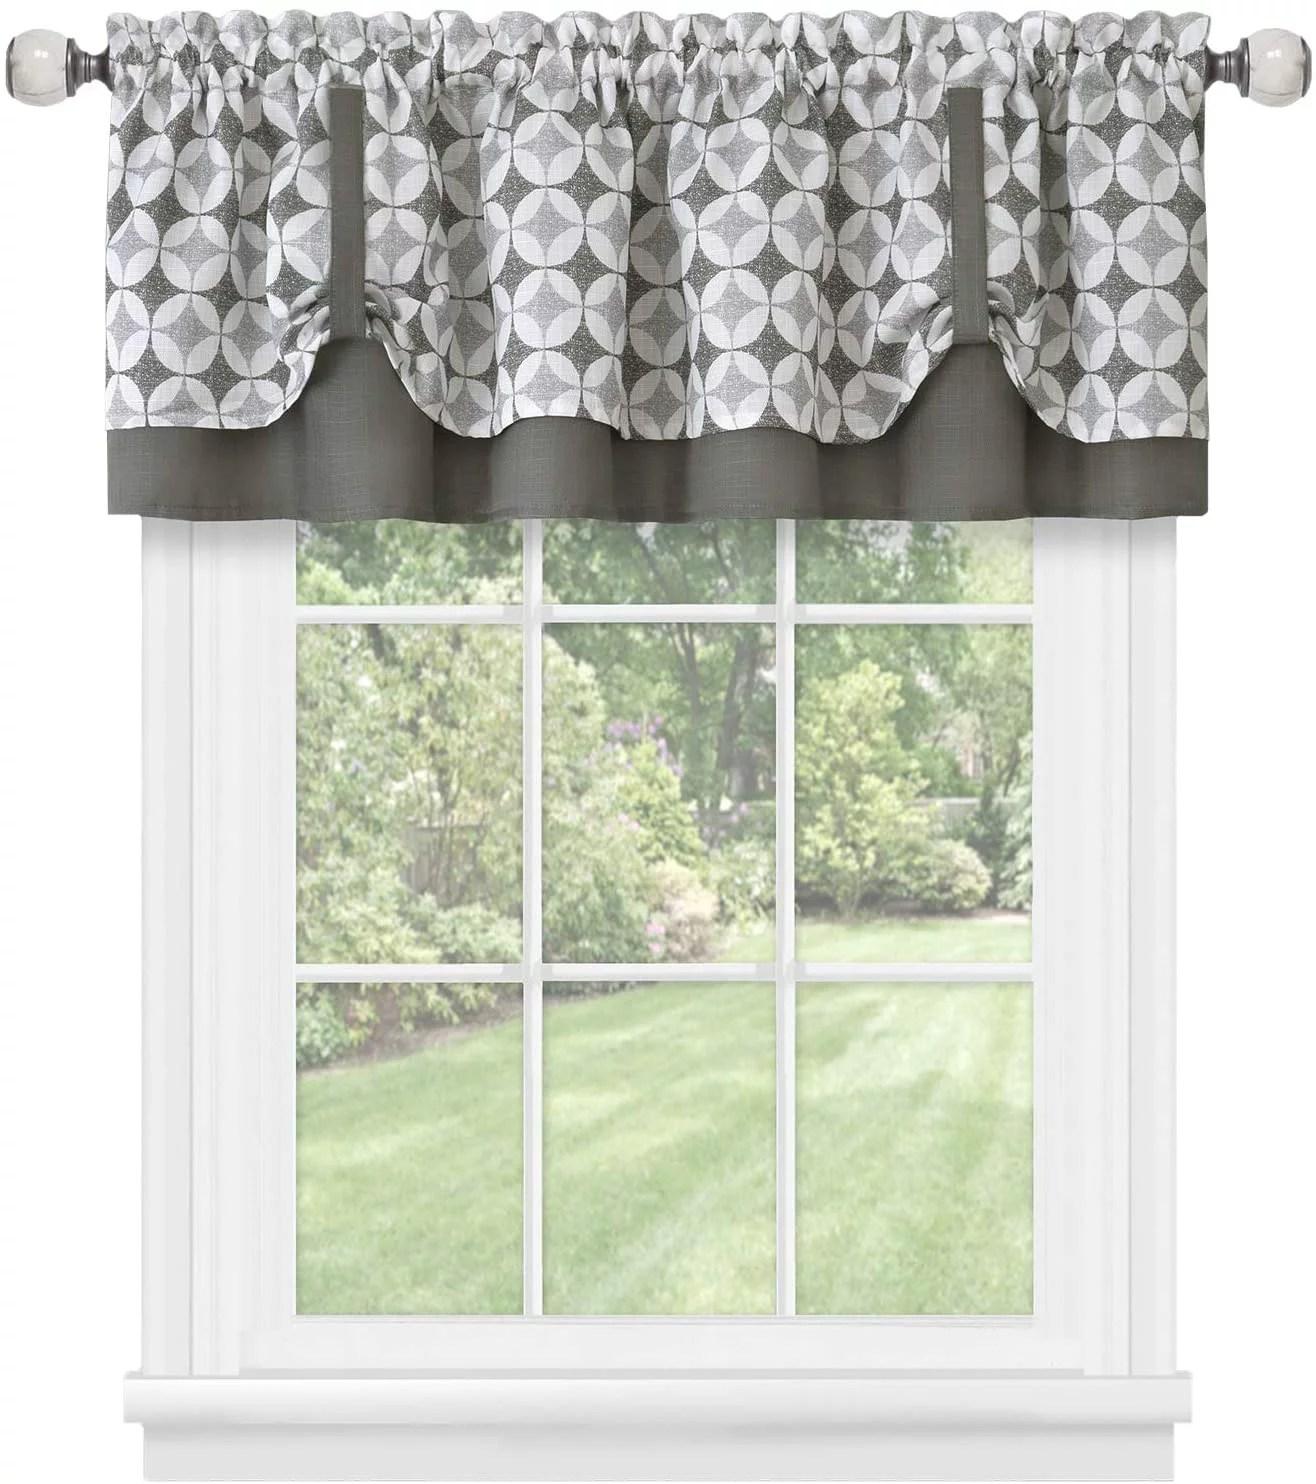 window curtain valance double layer geometric design with plaid gingham circles cuff tab top valance farmhouse decor 58 w x 14 l